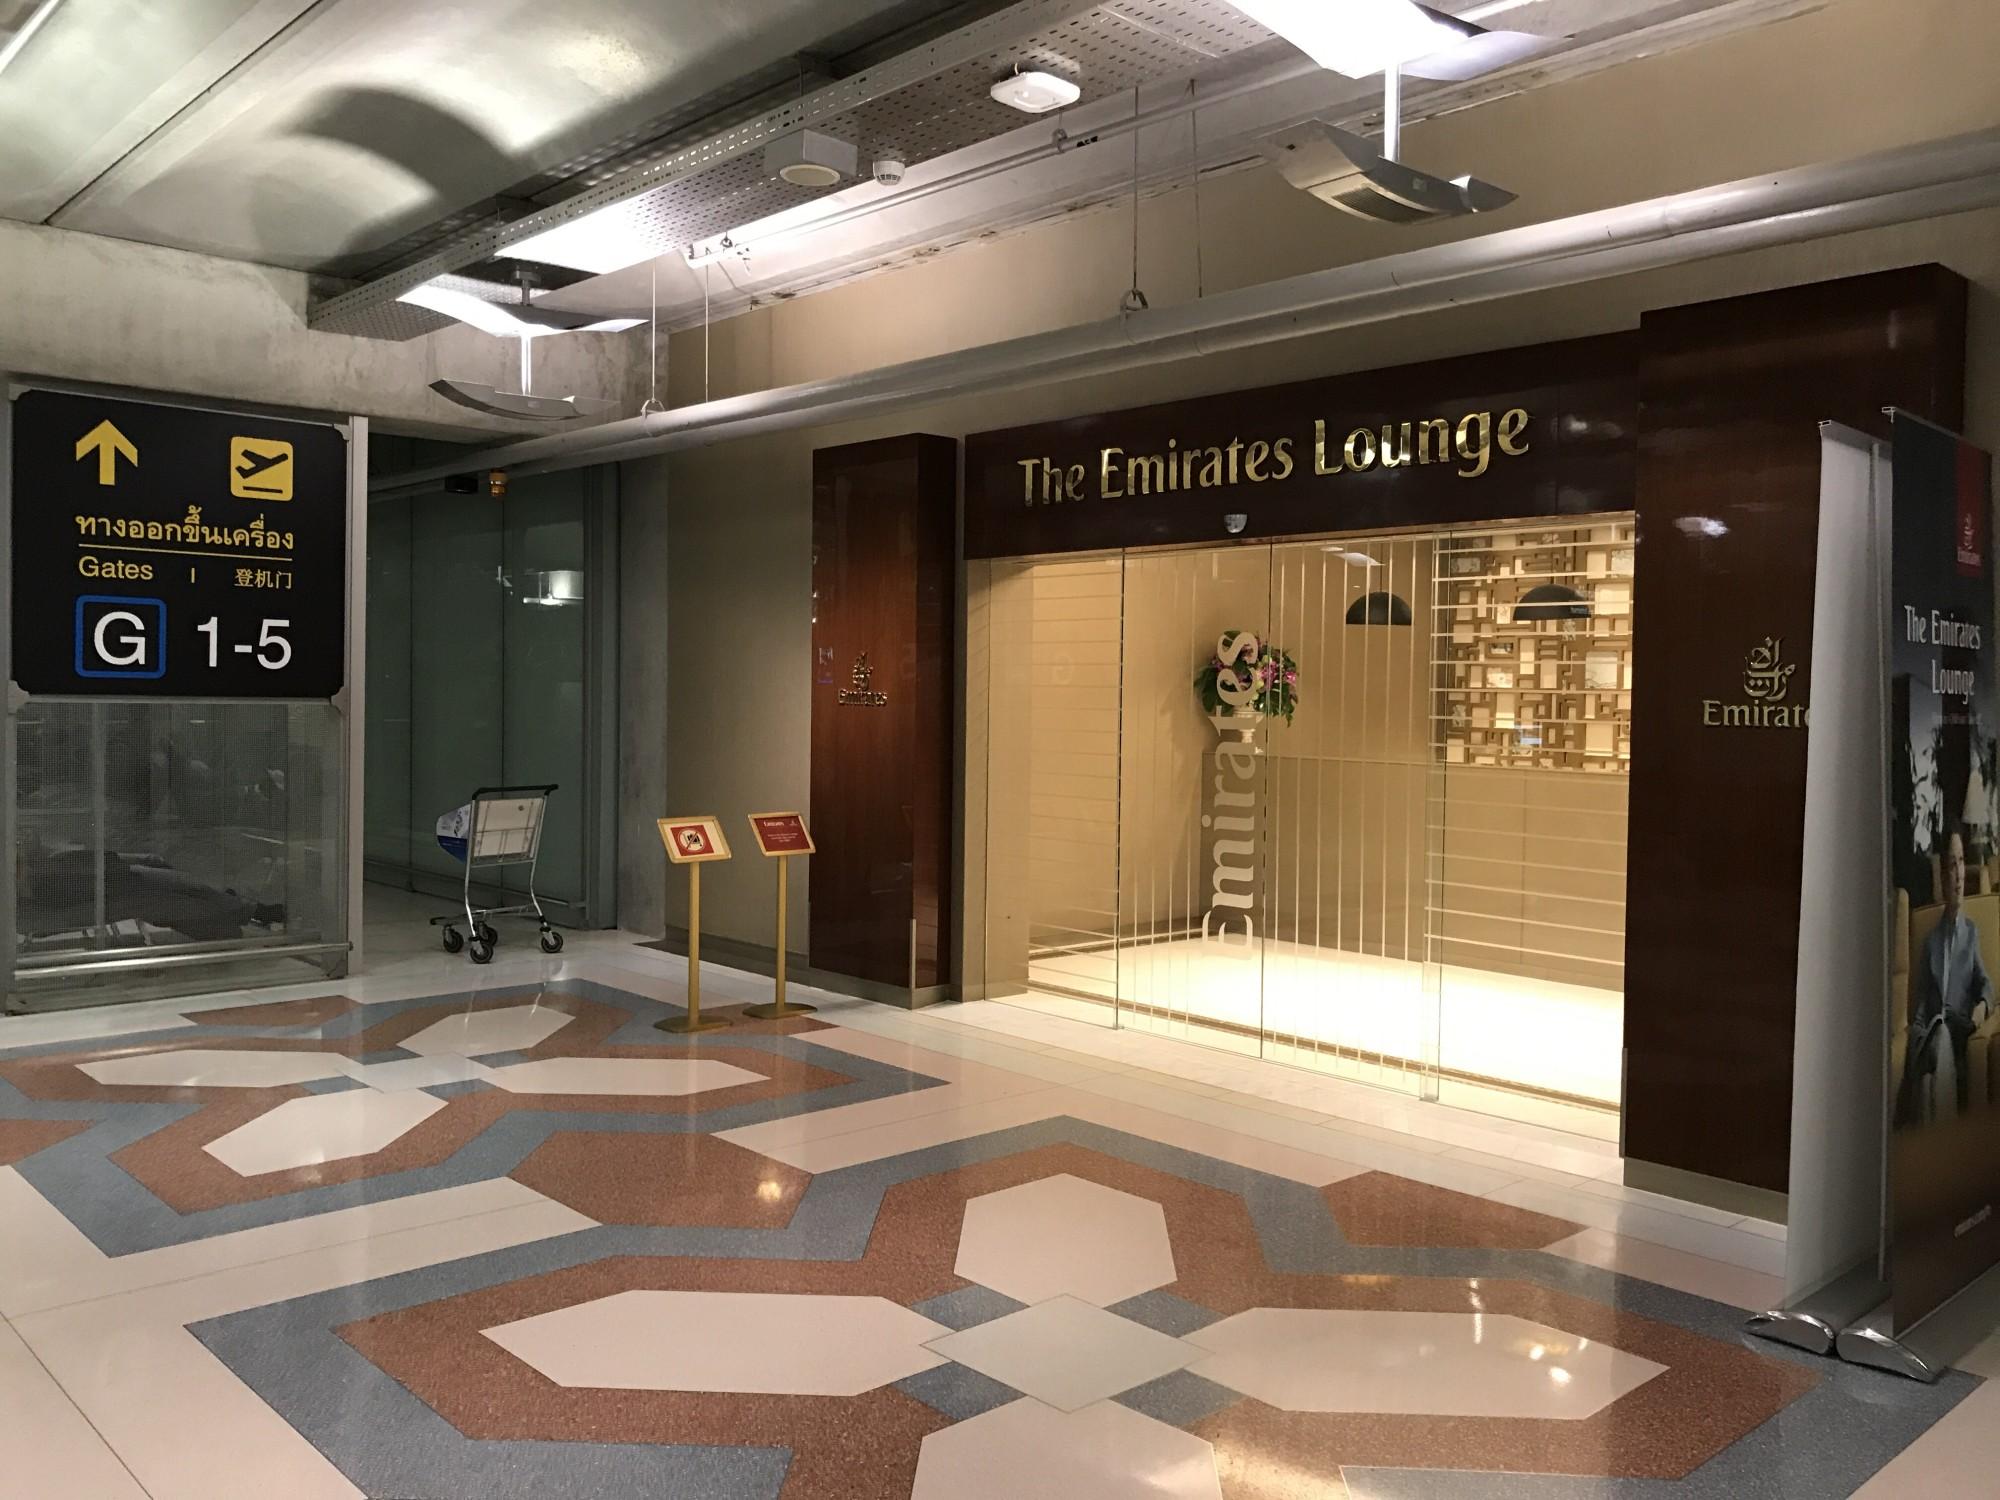 BKK: The Emirates Lounge Reviews & Photos - Concourse G